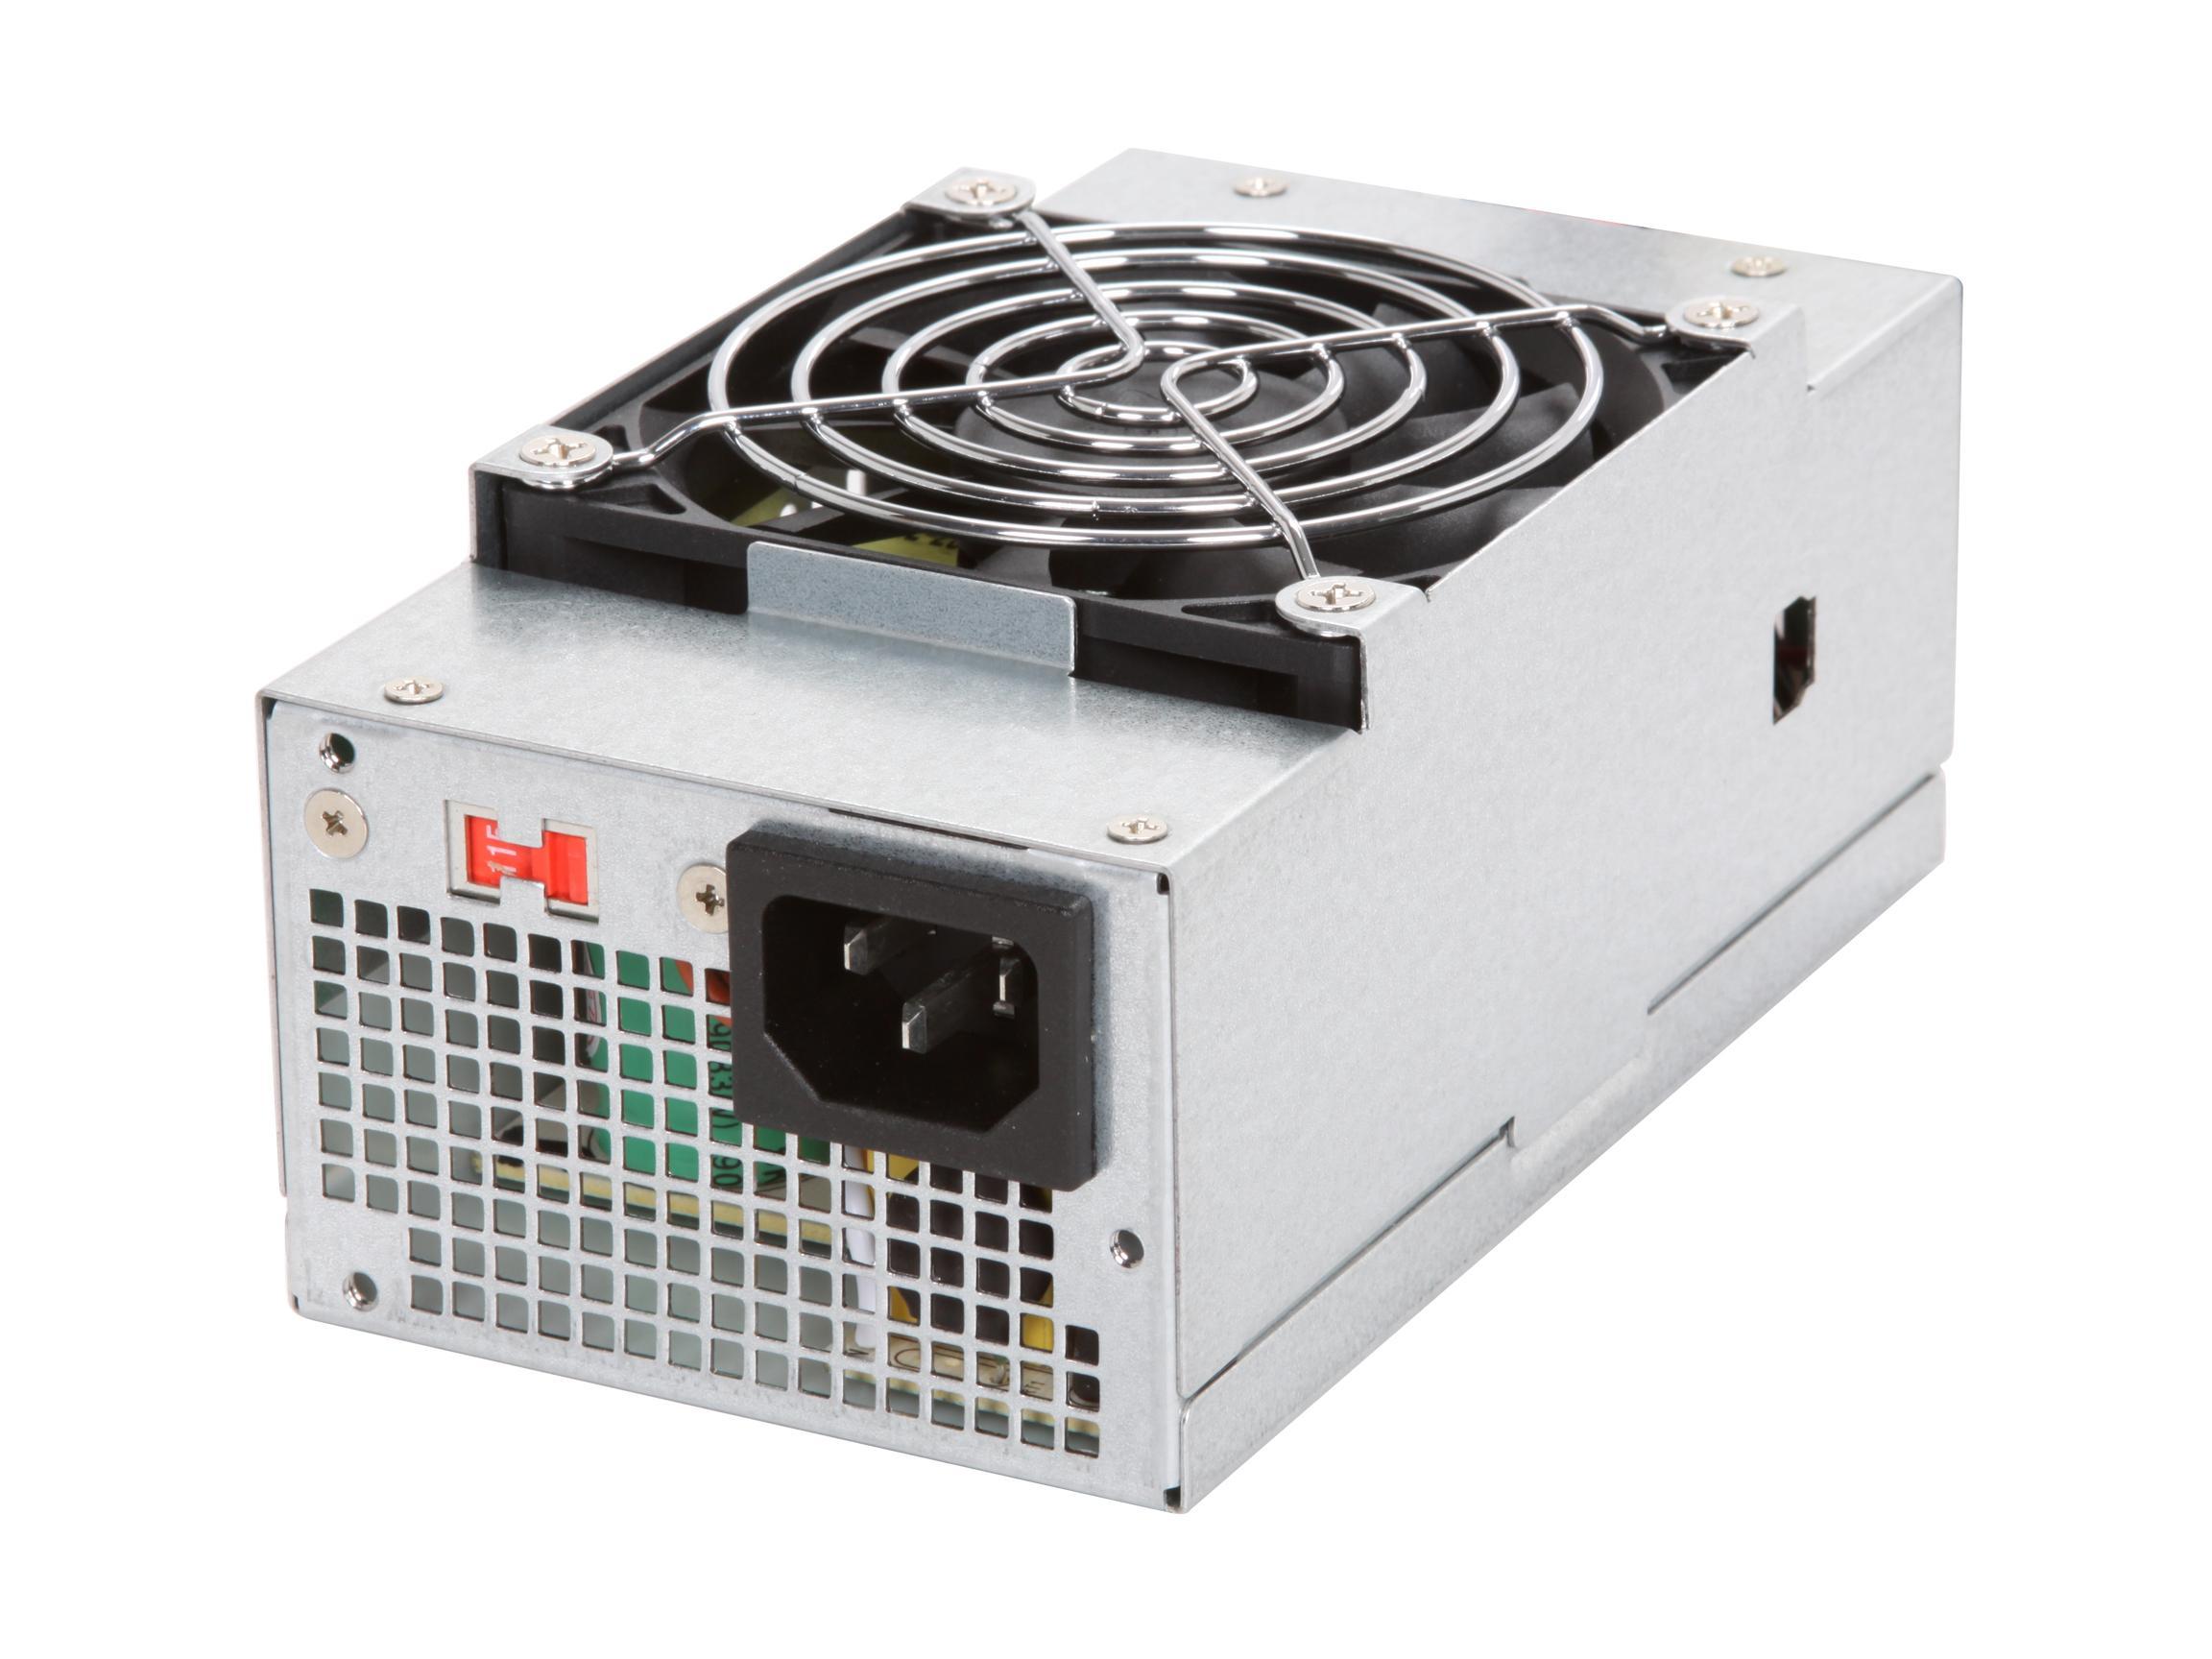 Rosewill Power Supply Tfx12v 300w 1000w Dell Wiring Diagram 12v 1000 W 450w 550w 600w